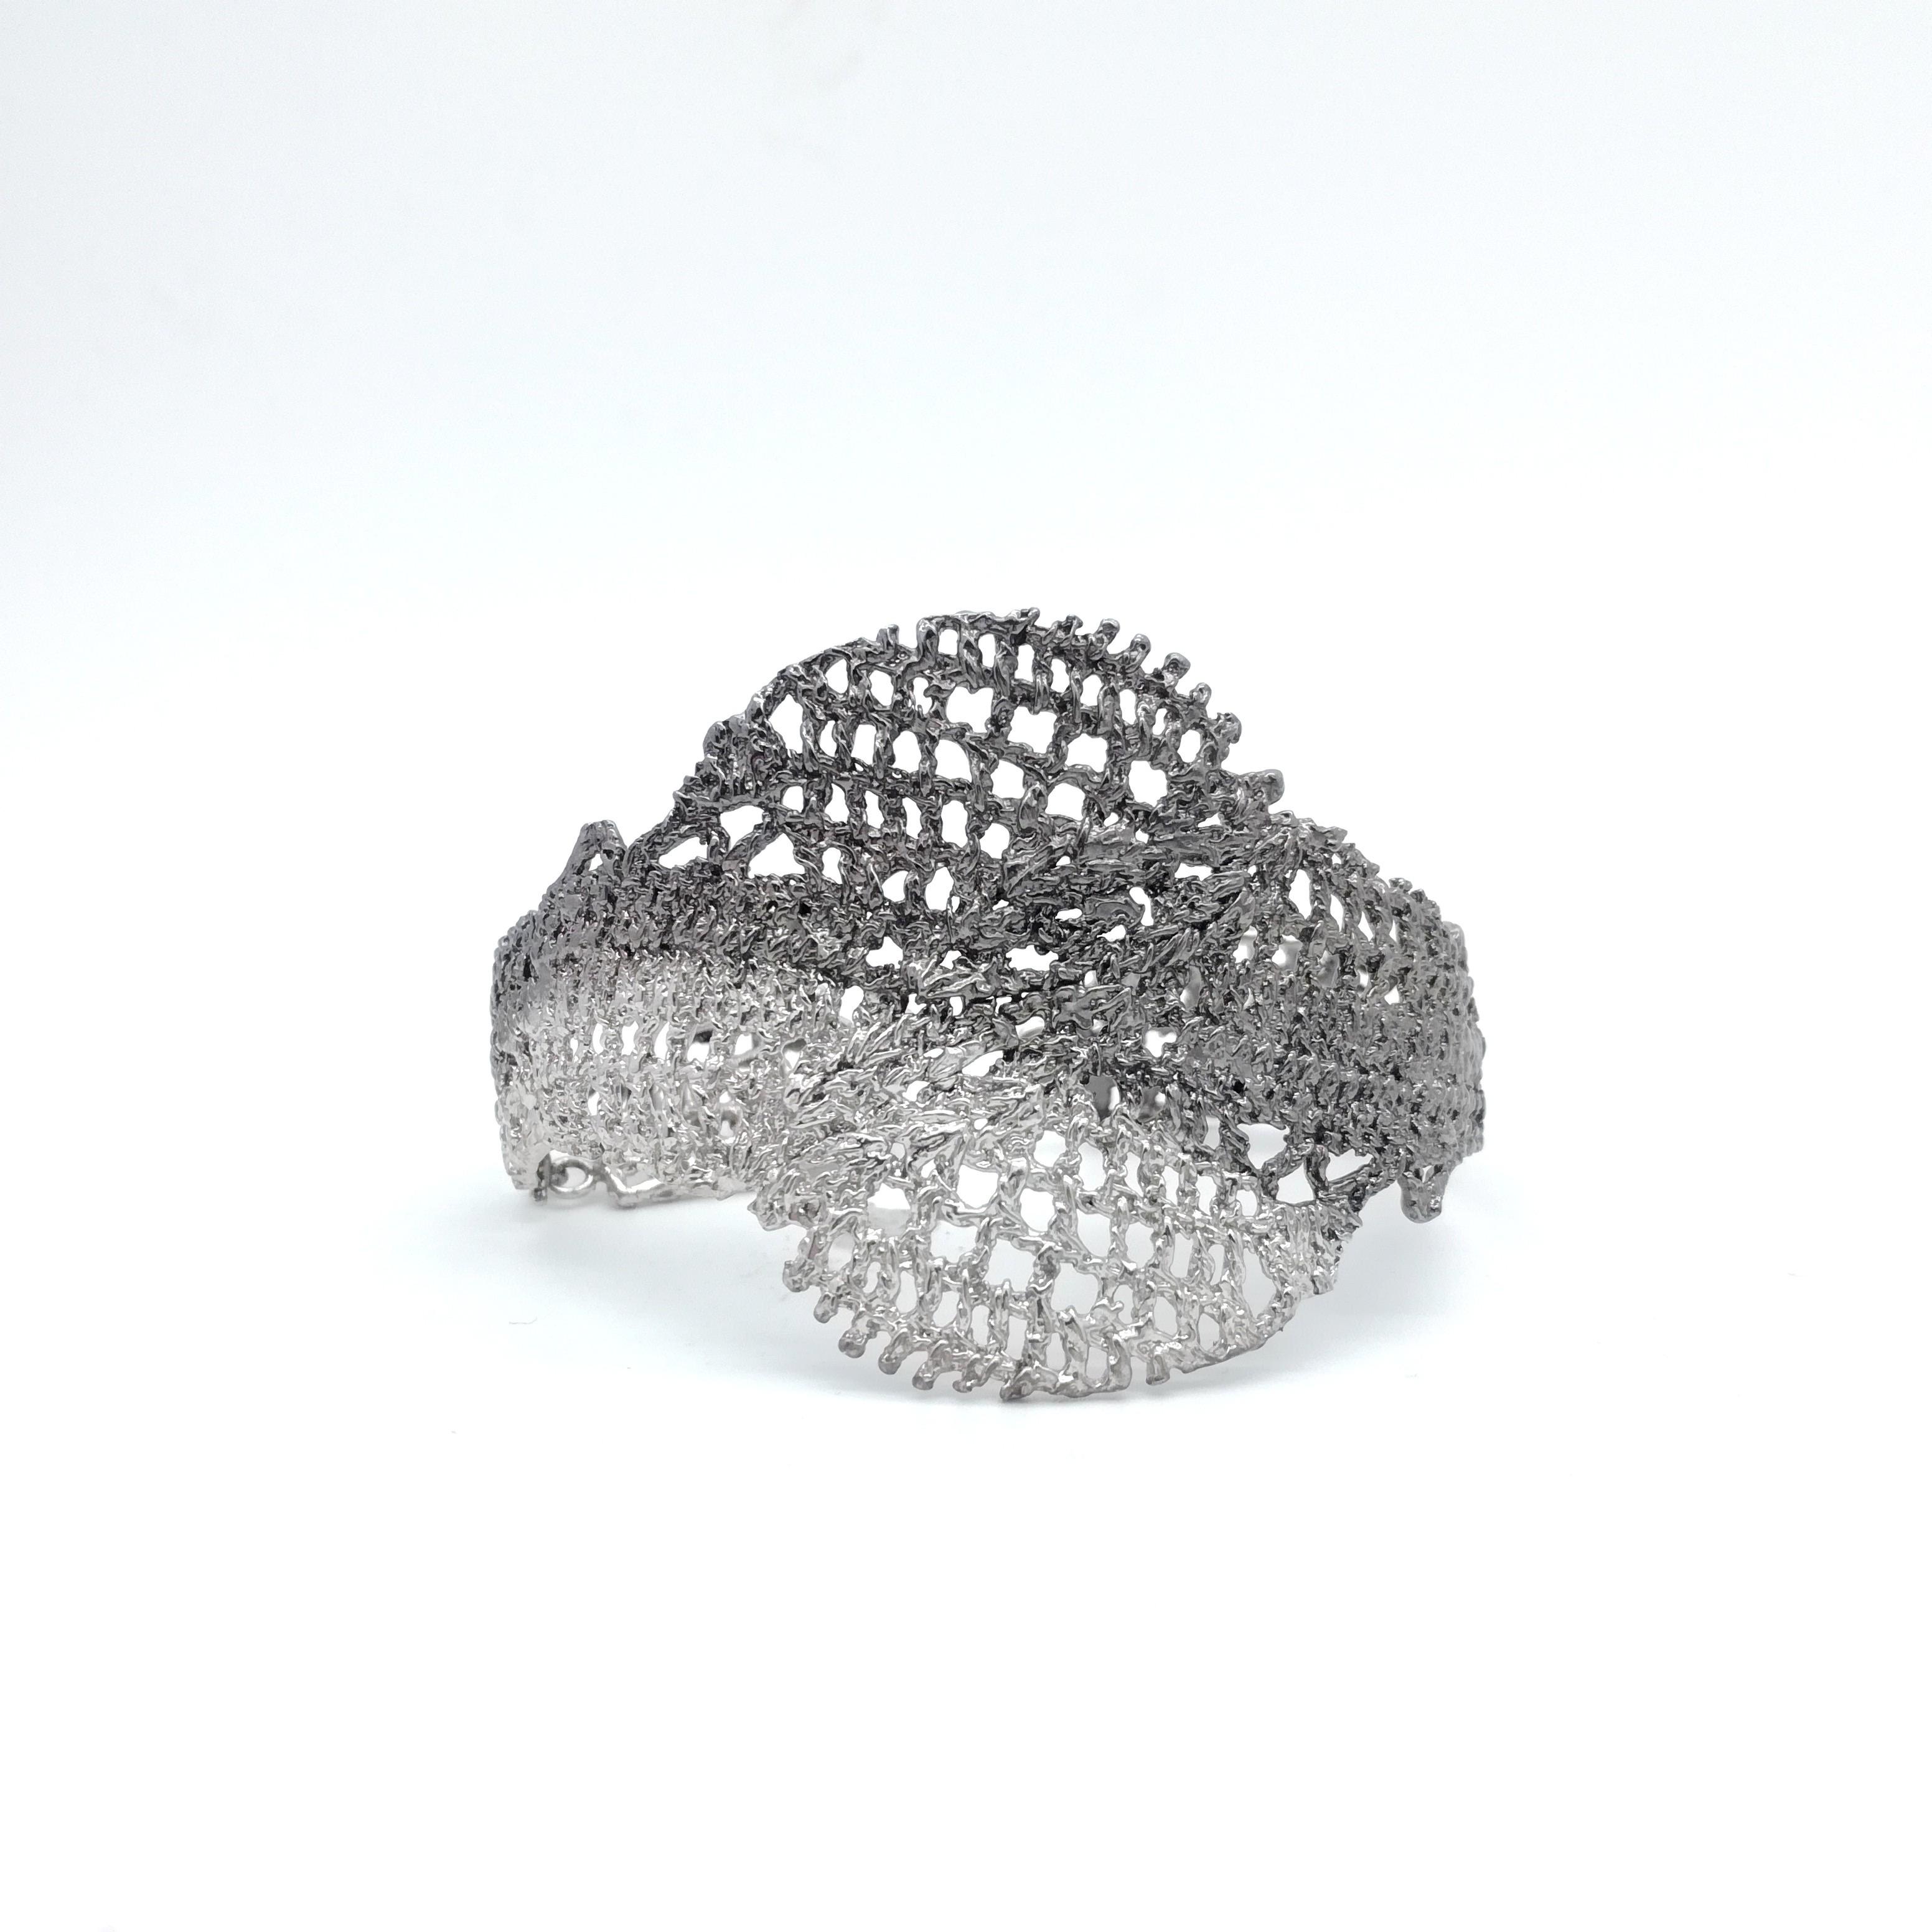 Bracelet handmade in 925 sterling silver rhodium and black rhodium plated